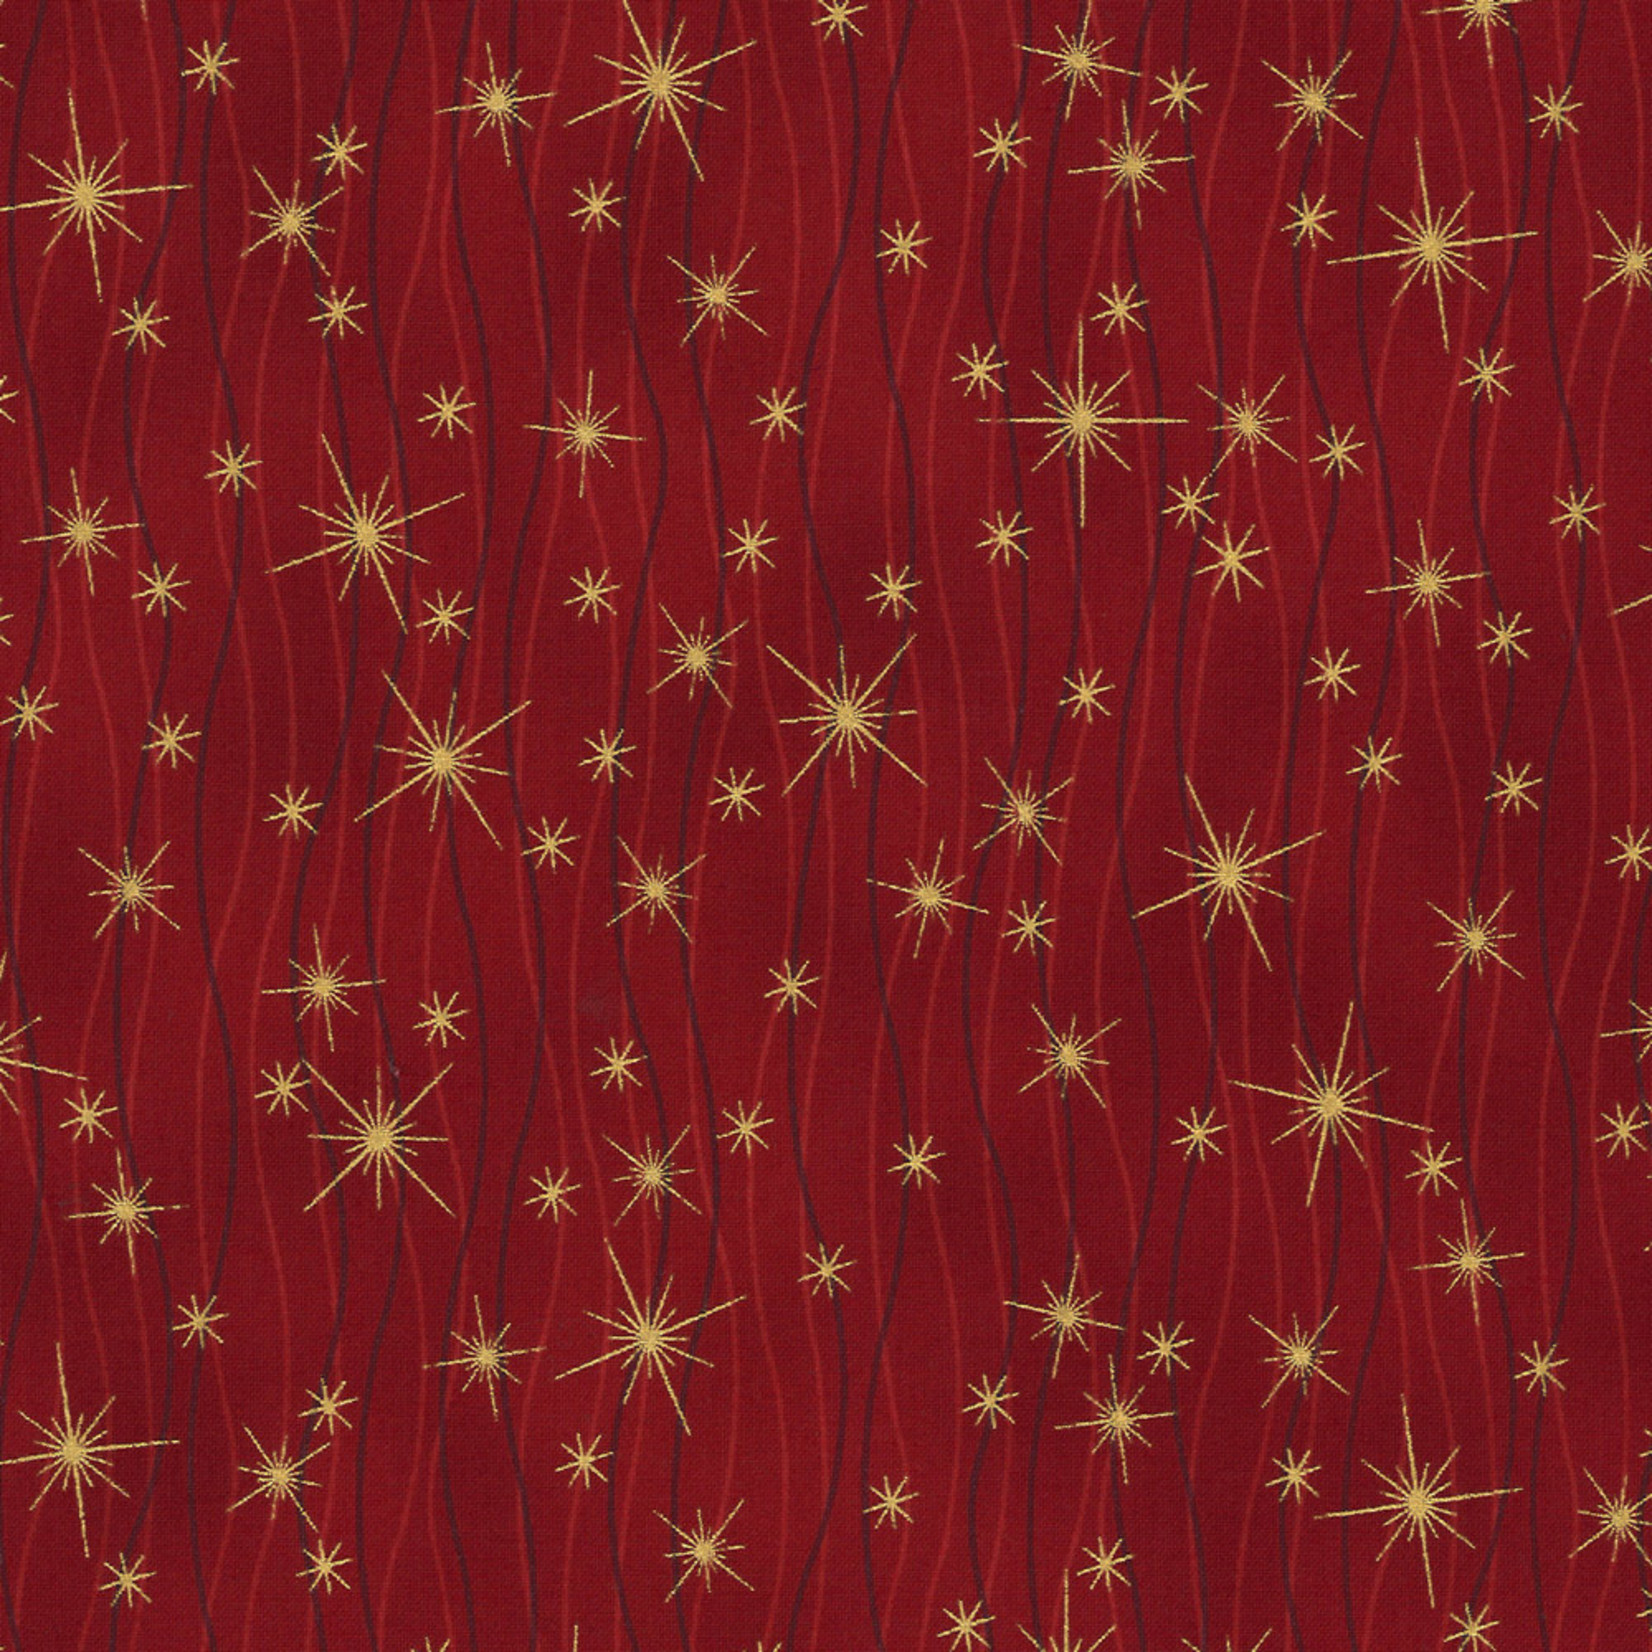 Stof Fabrics Christmas Wonders - Falling Stars - Red Gold